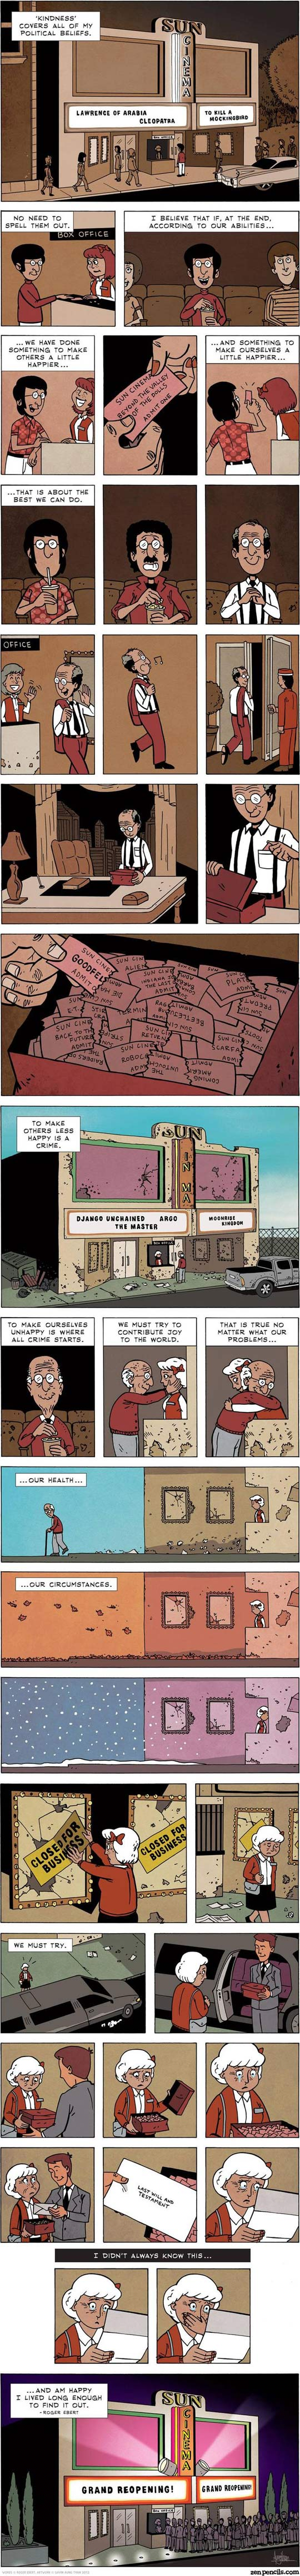 funny-cinema-story-old-man